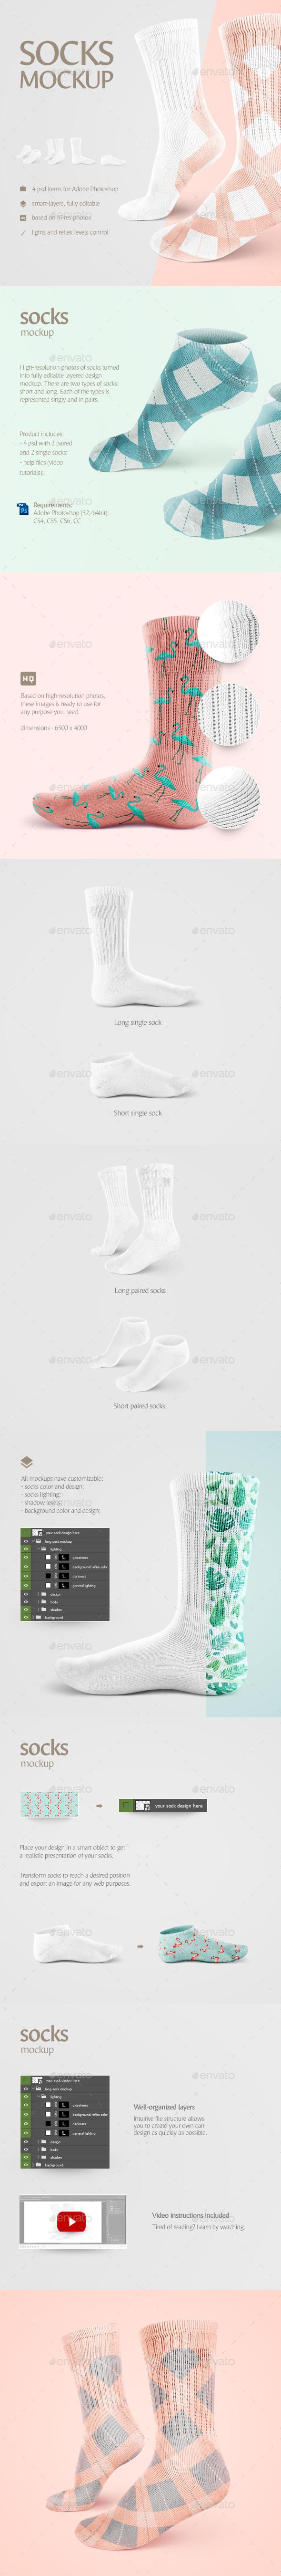 Socks Mockup - Miscellaneous Apparel